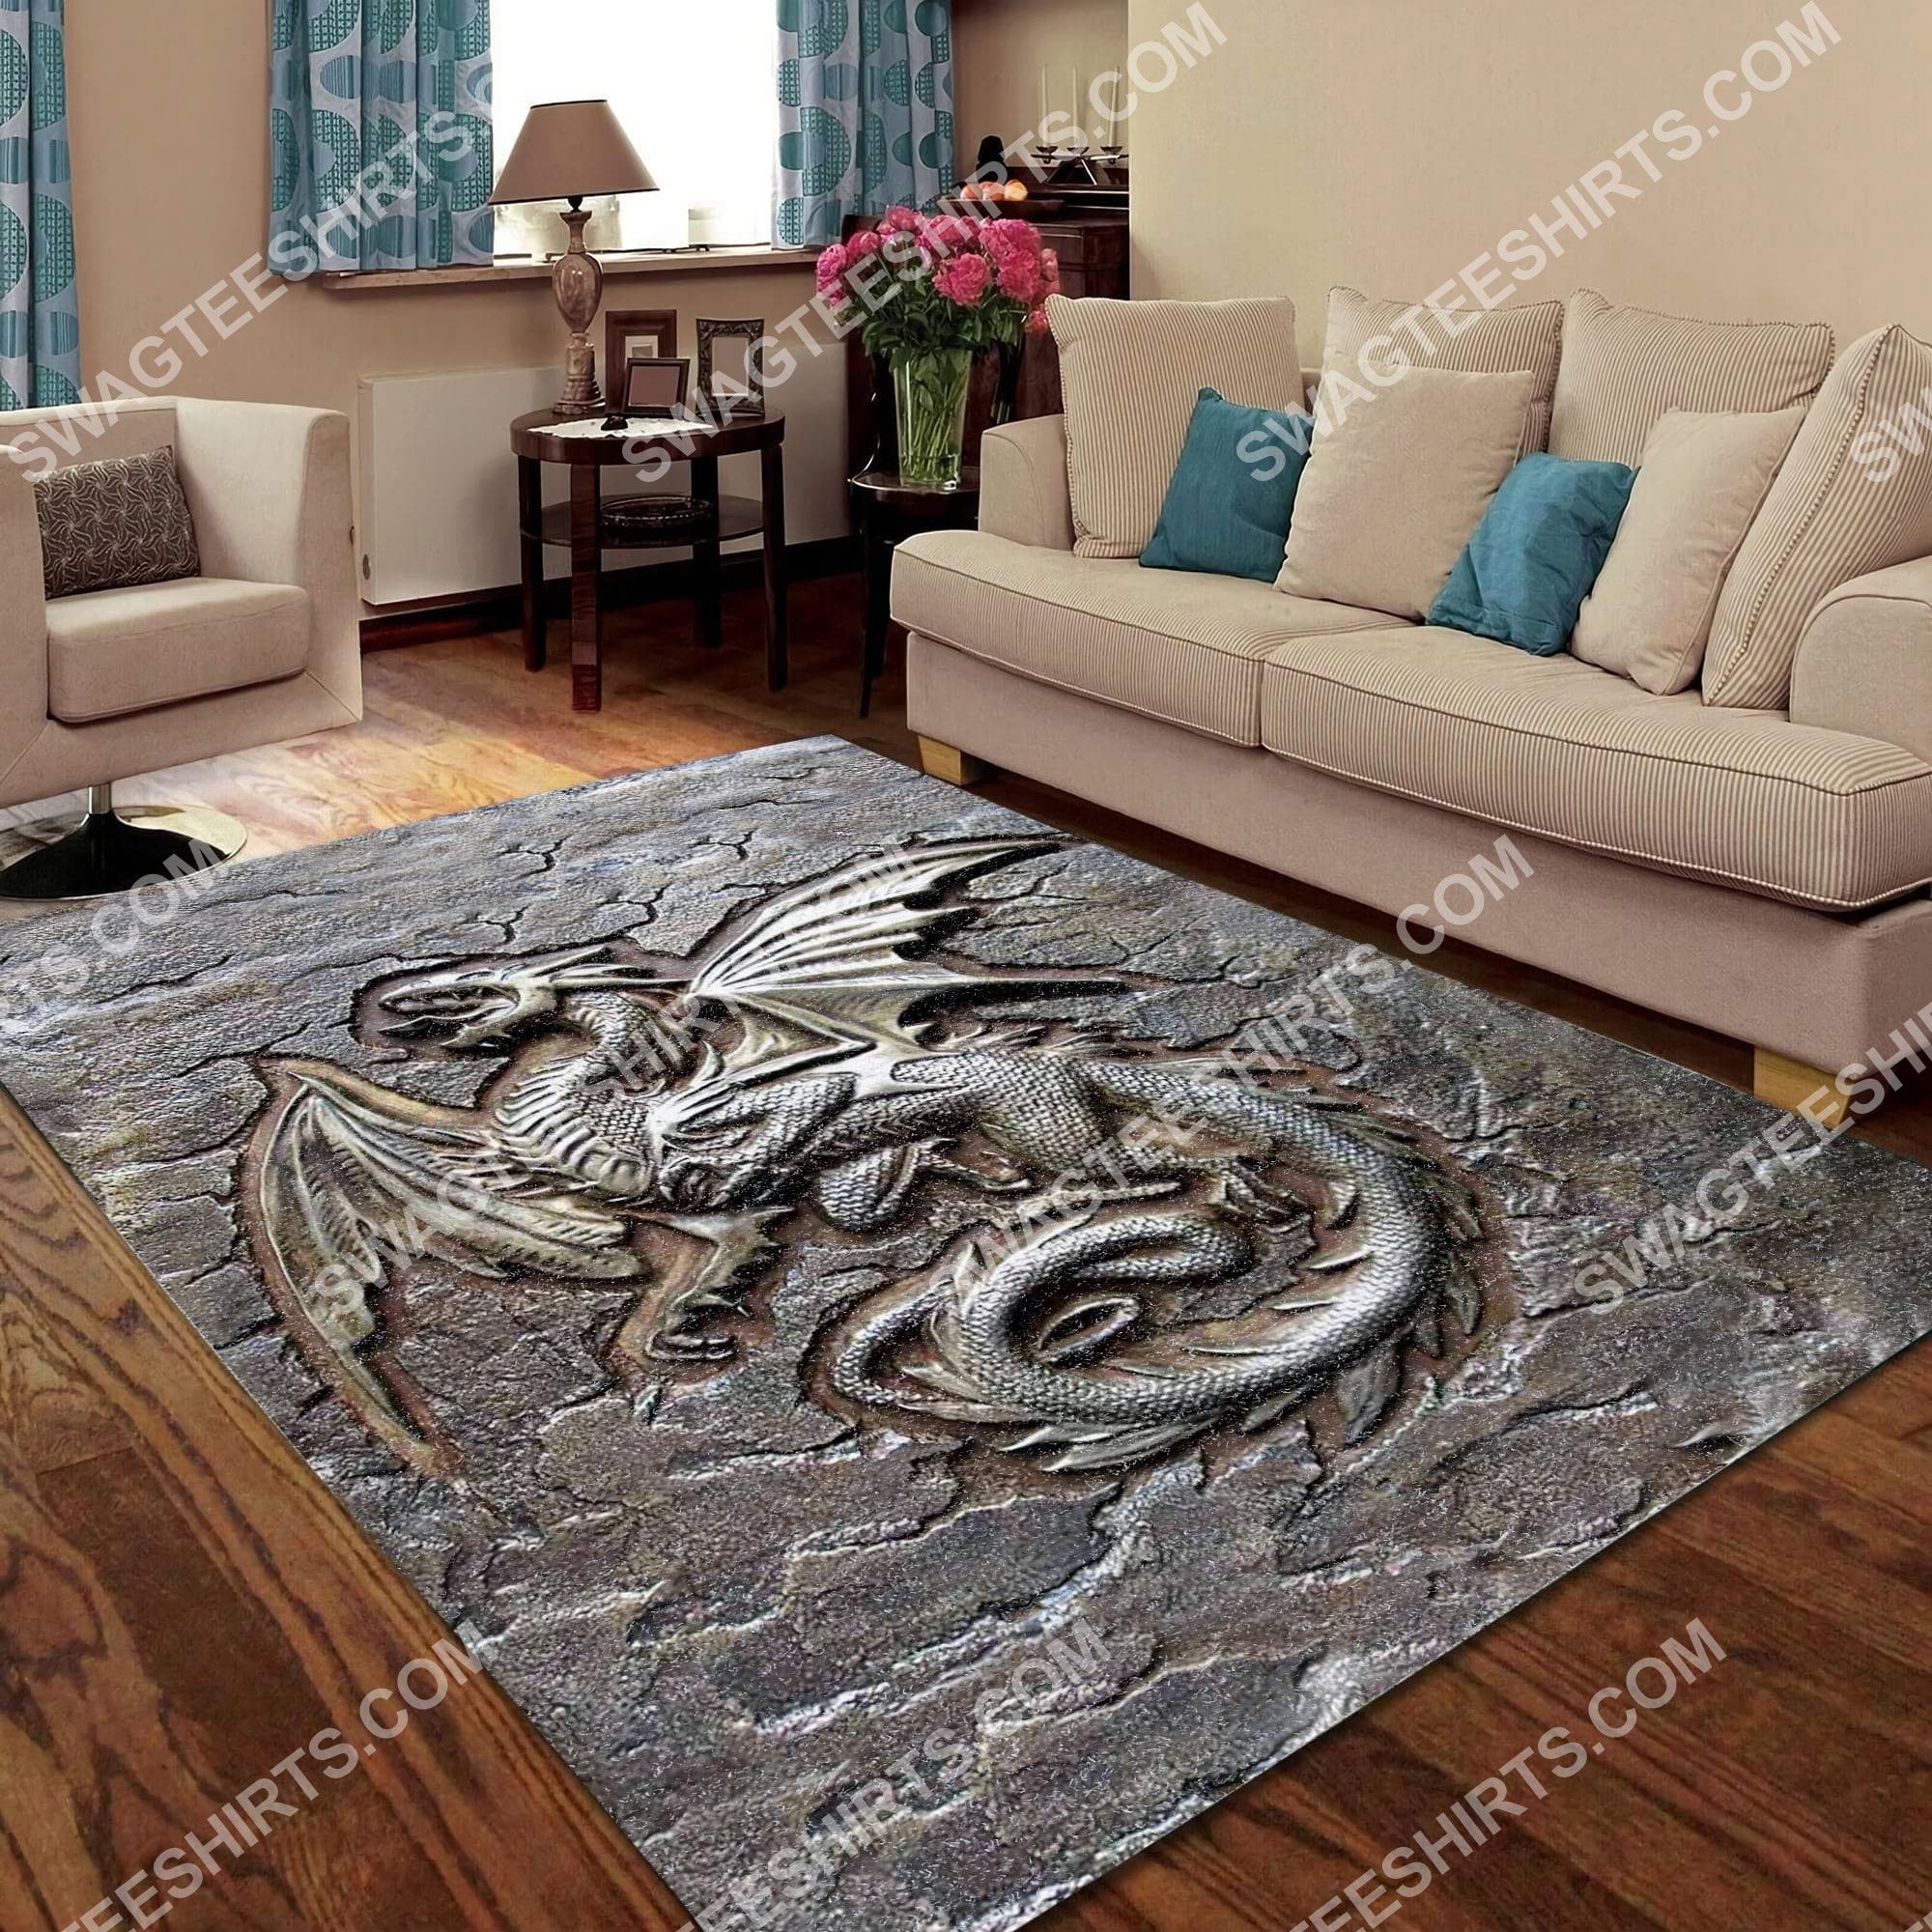 vintage dragon cracks metal all over printed rug 5(1)